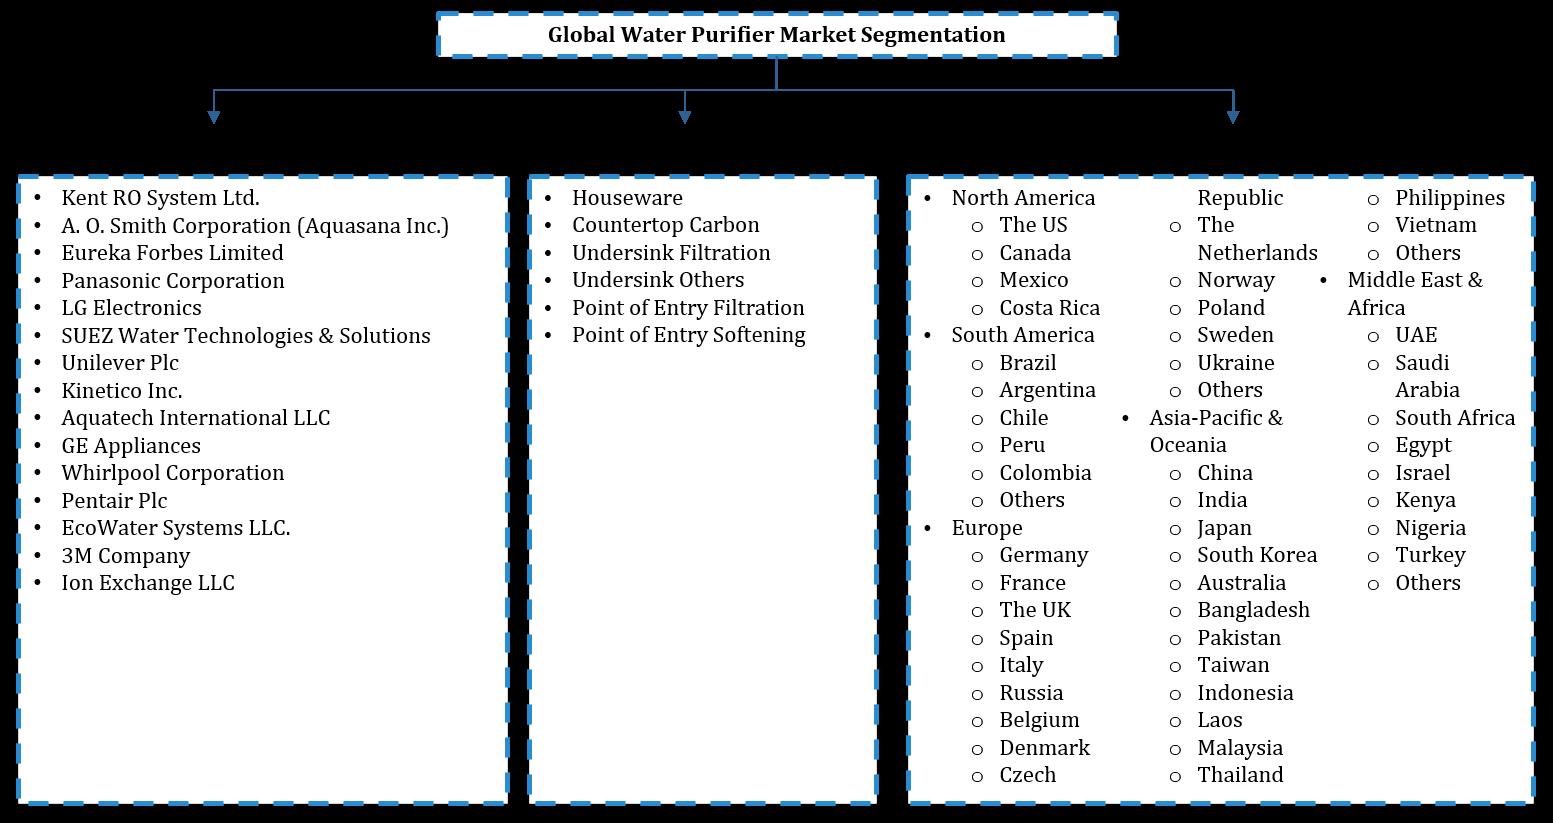 Global Water Purifiers Market Segmentation